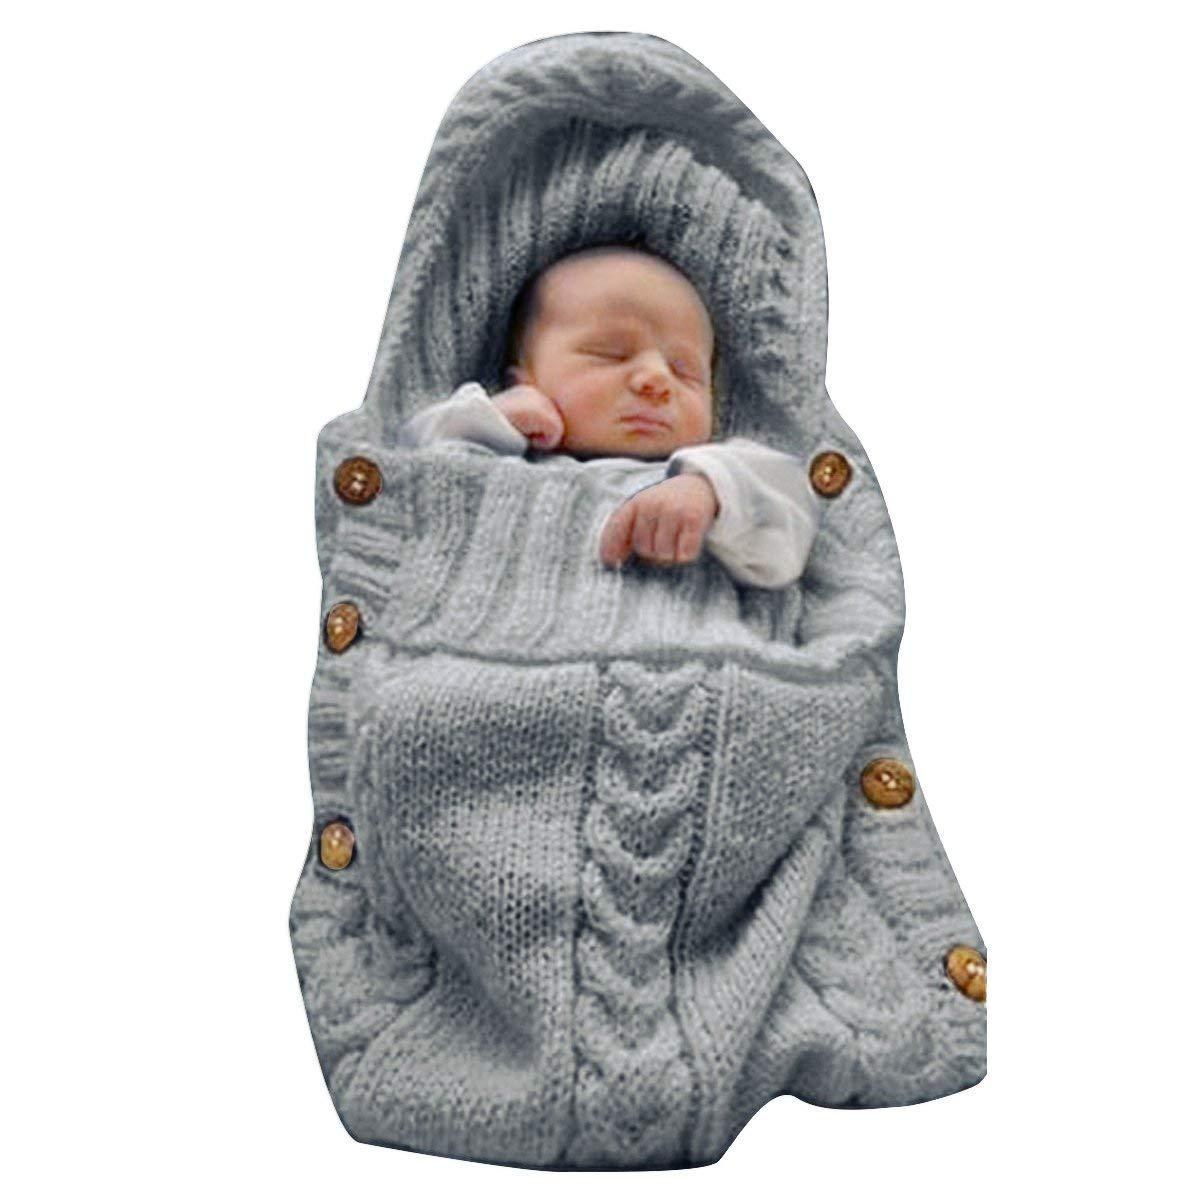 TOOGOO Manta Panales Envoltura Para Bebe Recien Nacido Bolsa De Dormir De Punto Saco De Dormir Envoltura De Cochecito Para Bebe Blanco